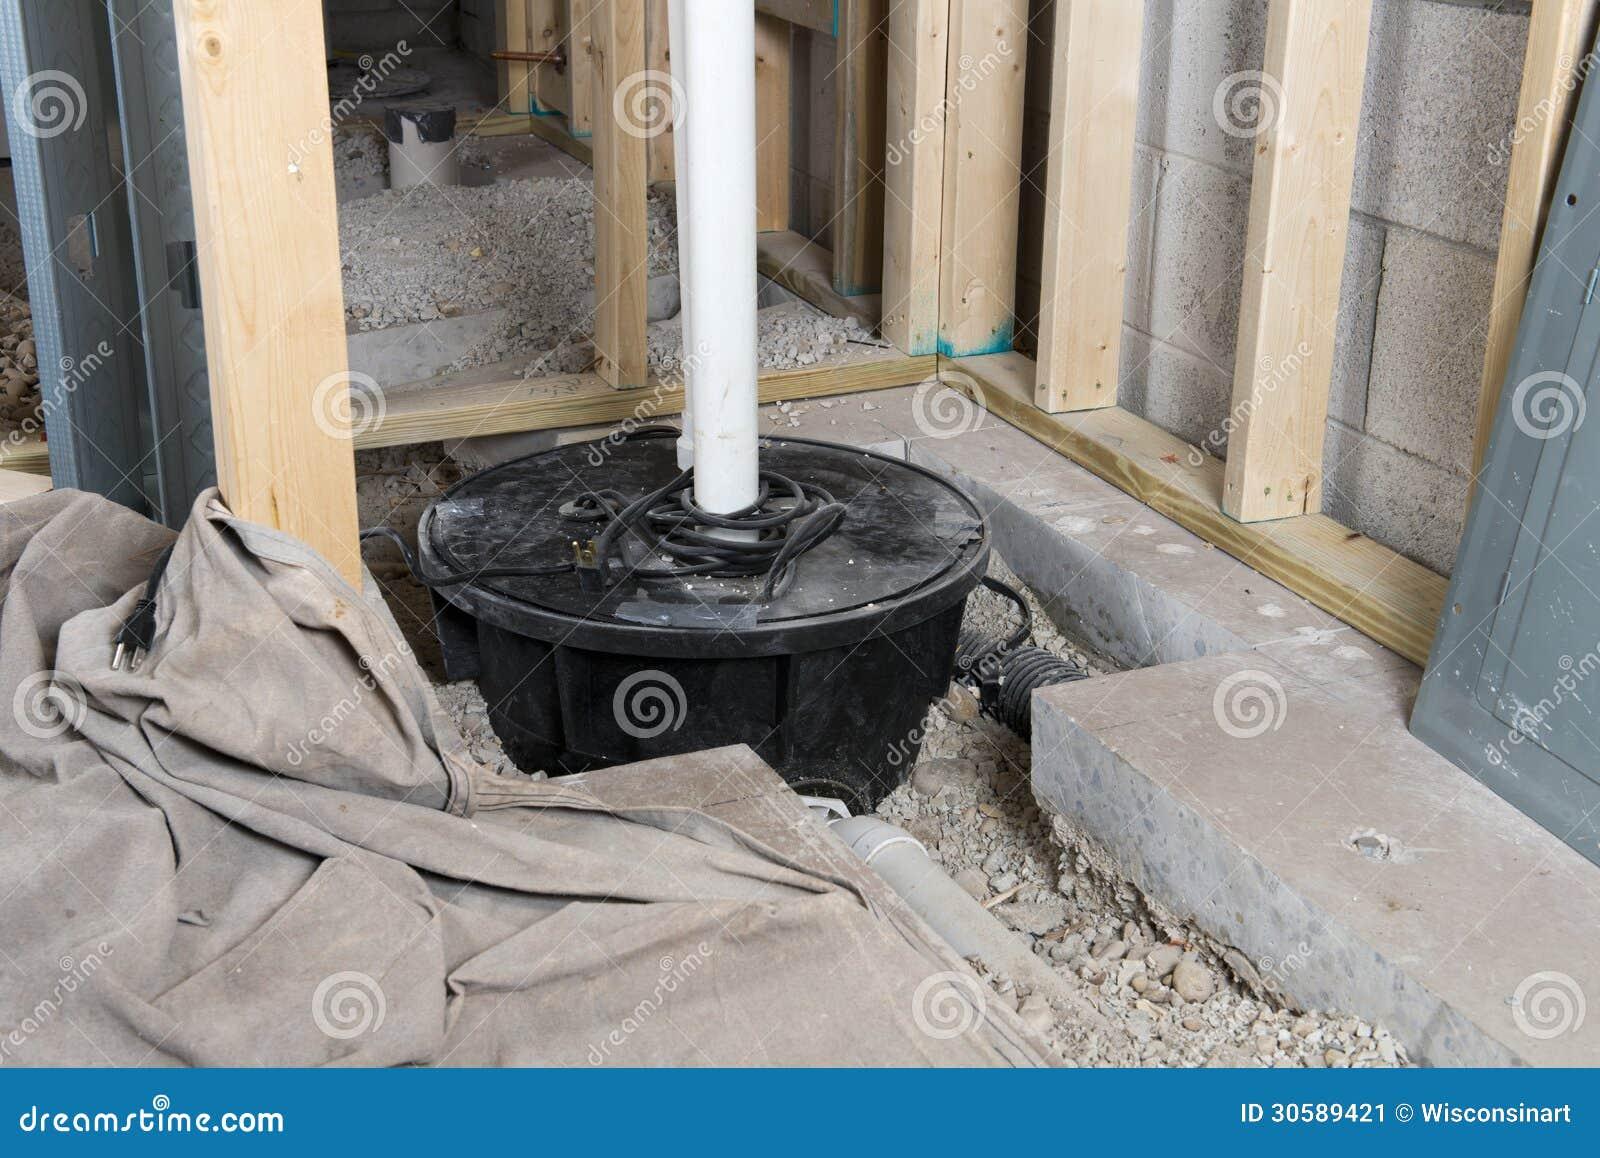 basement sump pump crock home improvement stock image. Black Bedroom Furniture Sets. Home Design Ideas